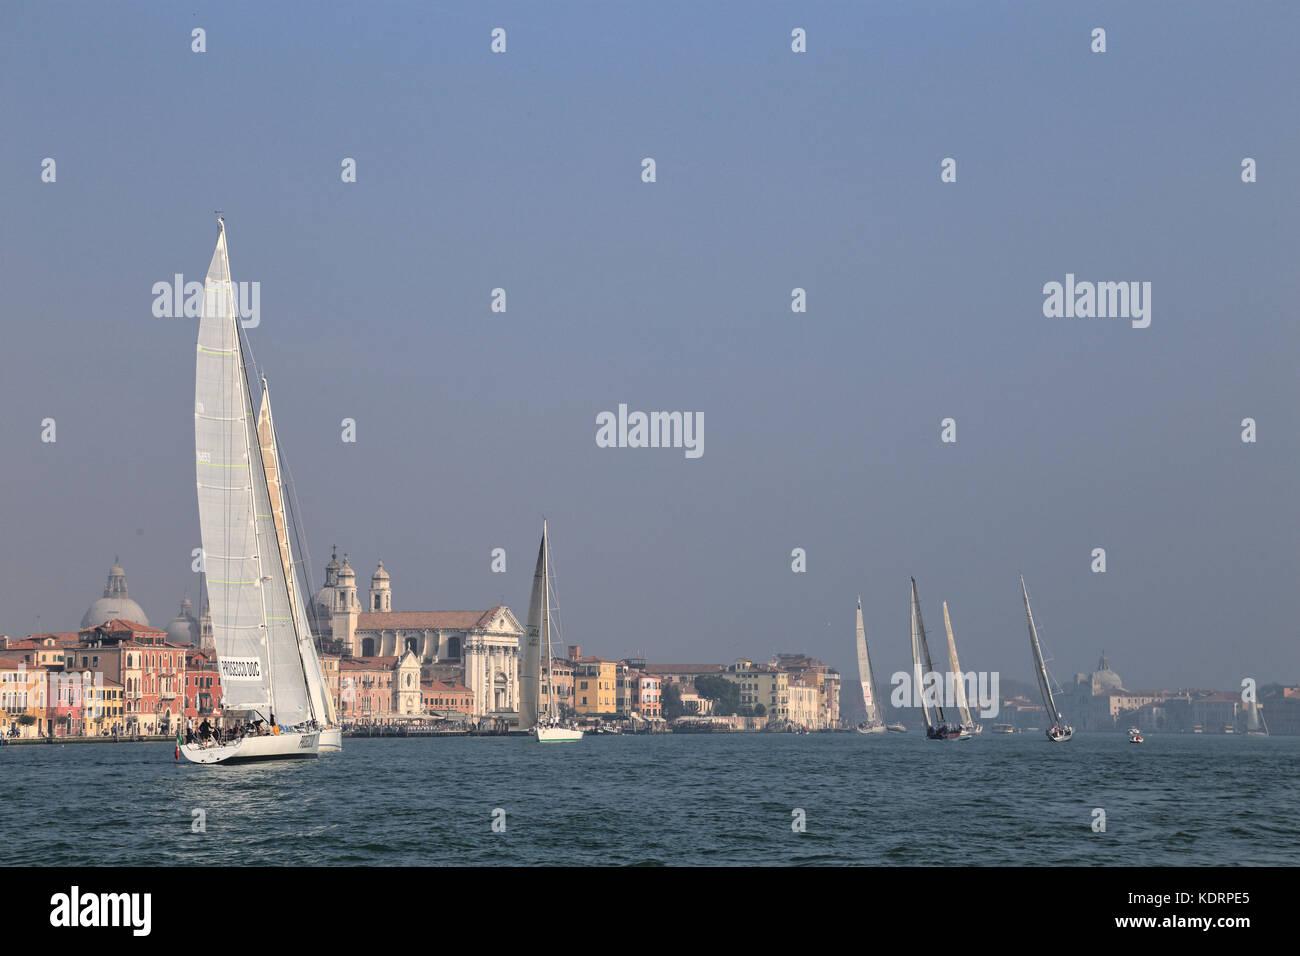 Sailing yacht racing 'Venice Hospitality Challenge' and 'Regata La Veleziana' 2017 - Stock Image